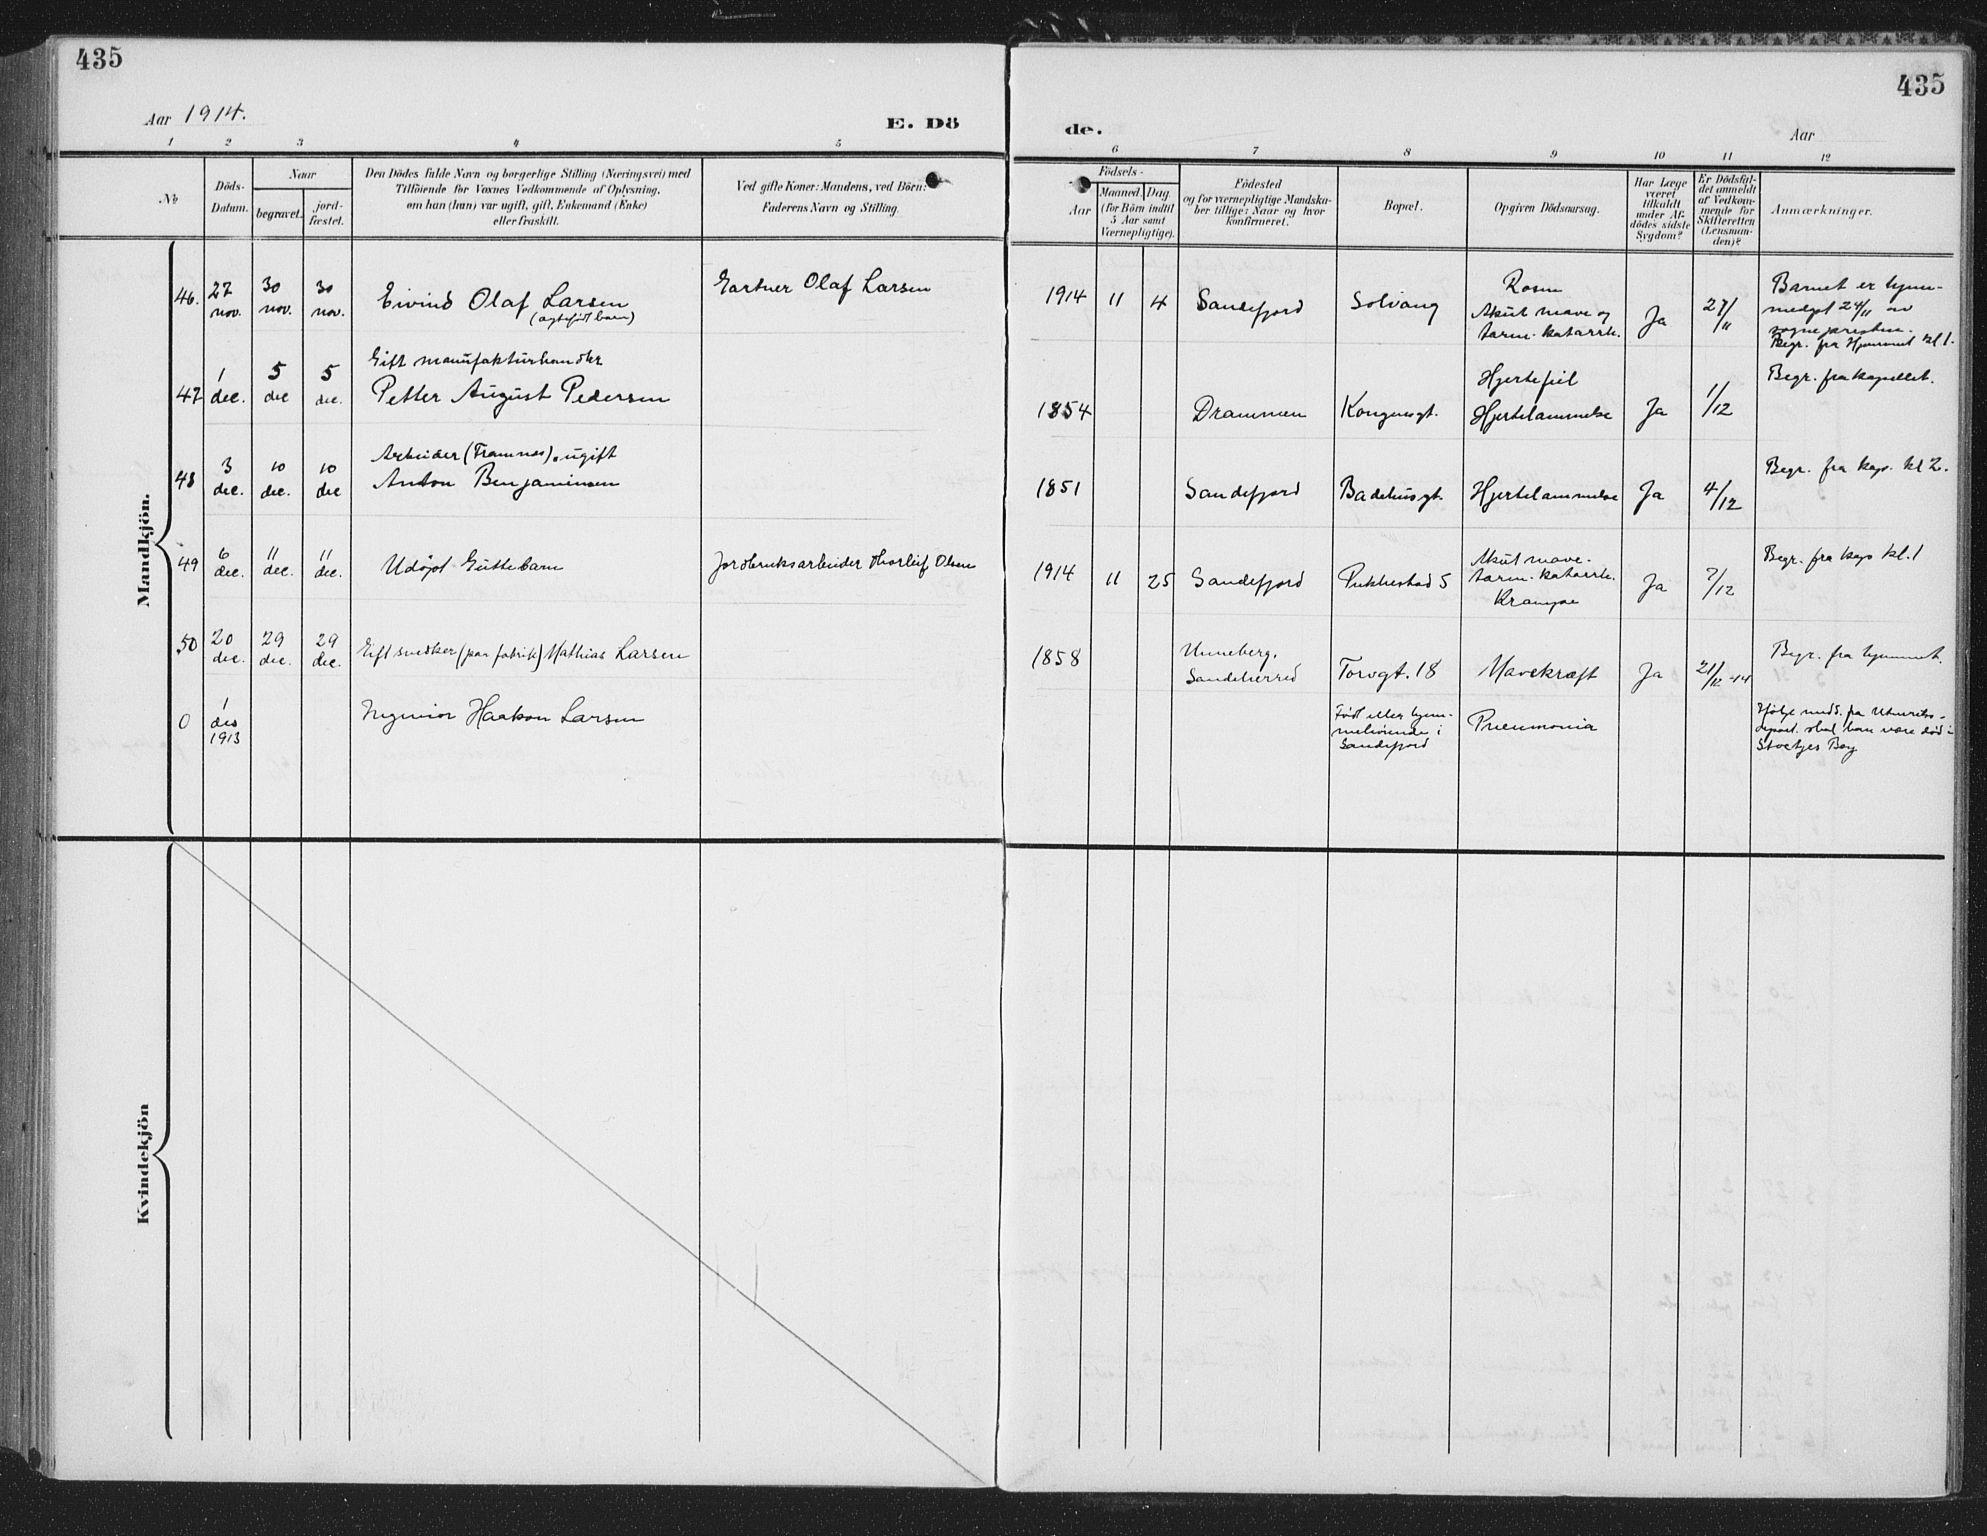 SAKO, Sandefjord kirkebøker, G/Ga/L0003: Parish register (copy) no. 3, 1903-1920, p. 435